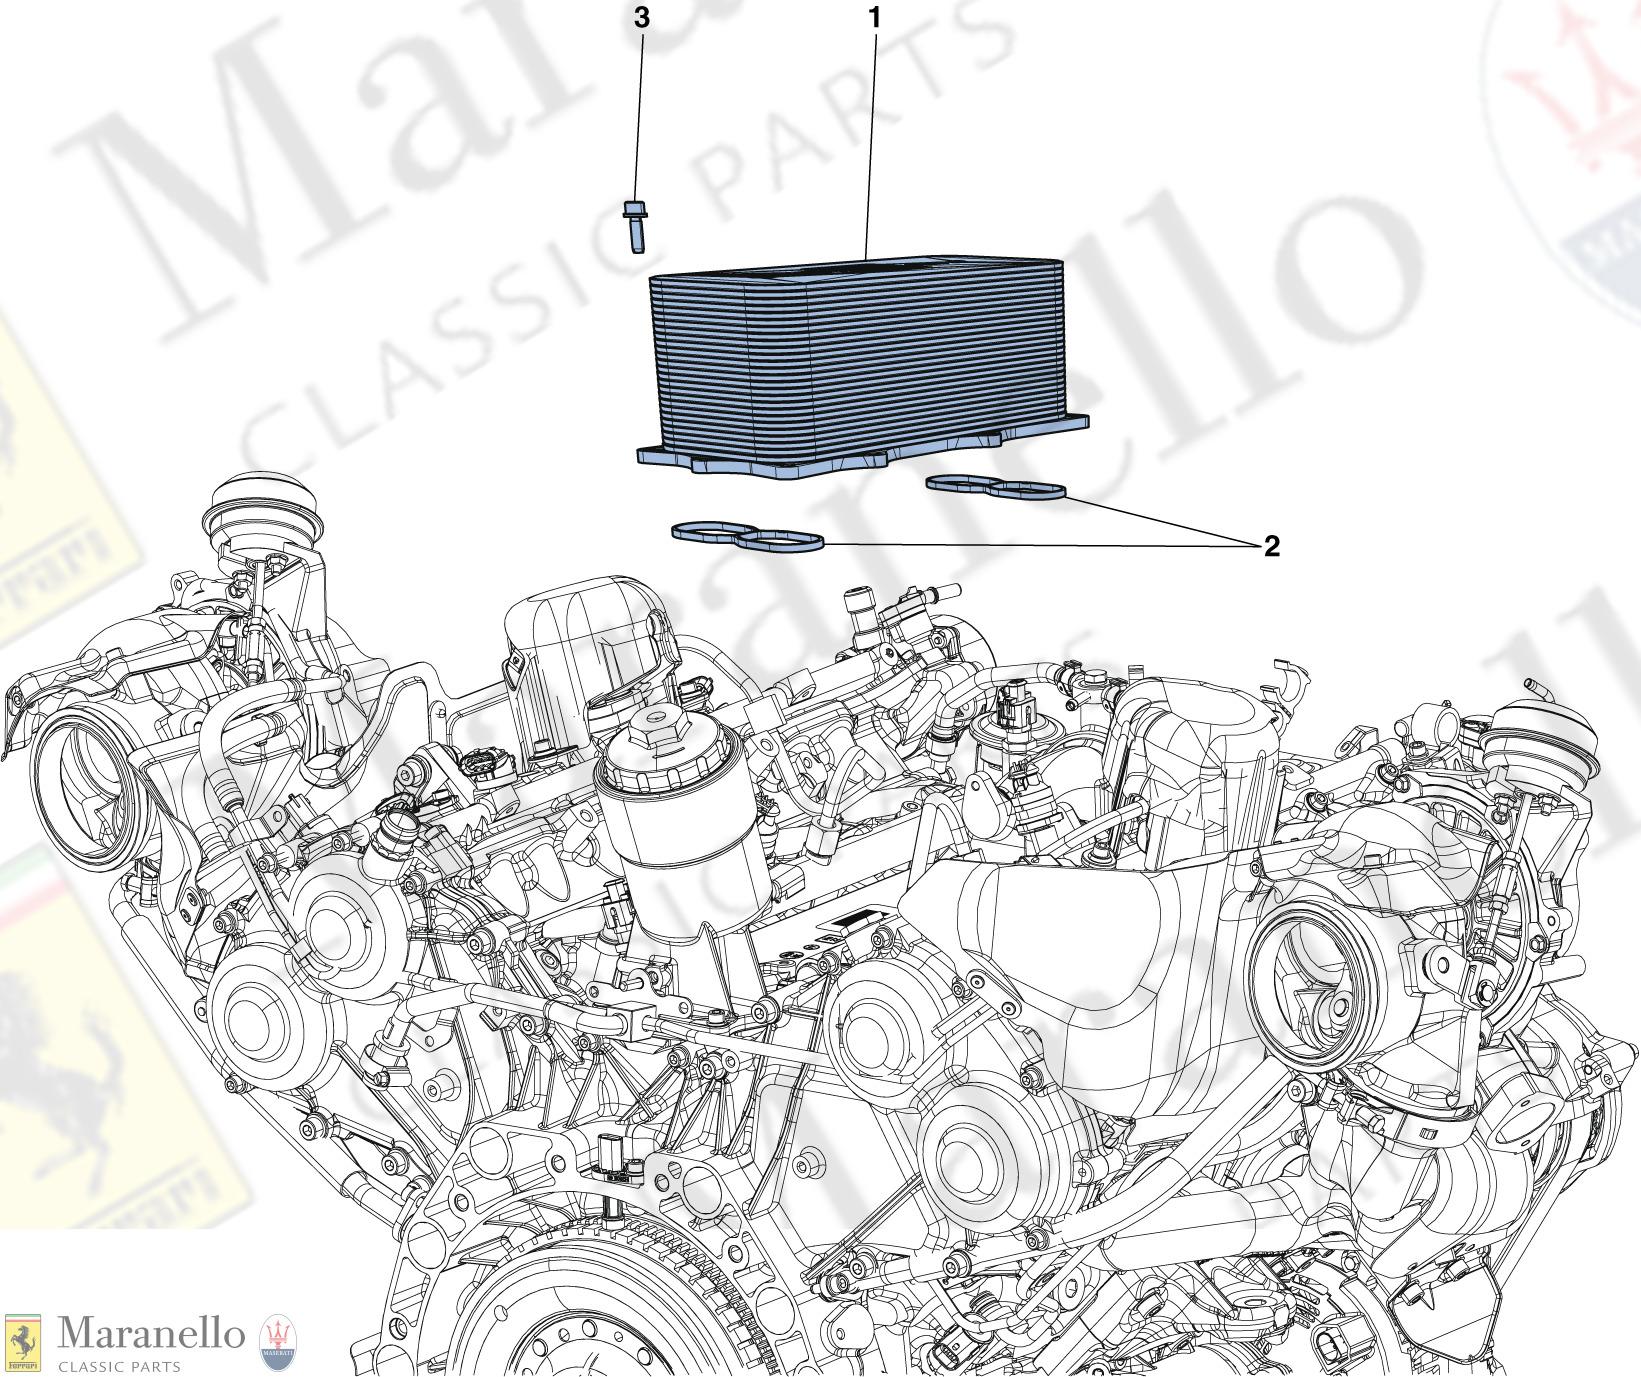 020 - Engine Heat Exchanger parts diagram for Ferrari 488 GTB   Maranello  Classic PartsMaranello Classic Parts